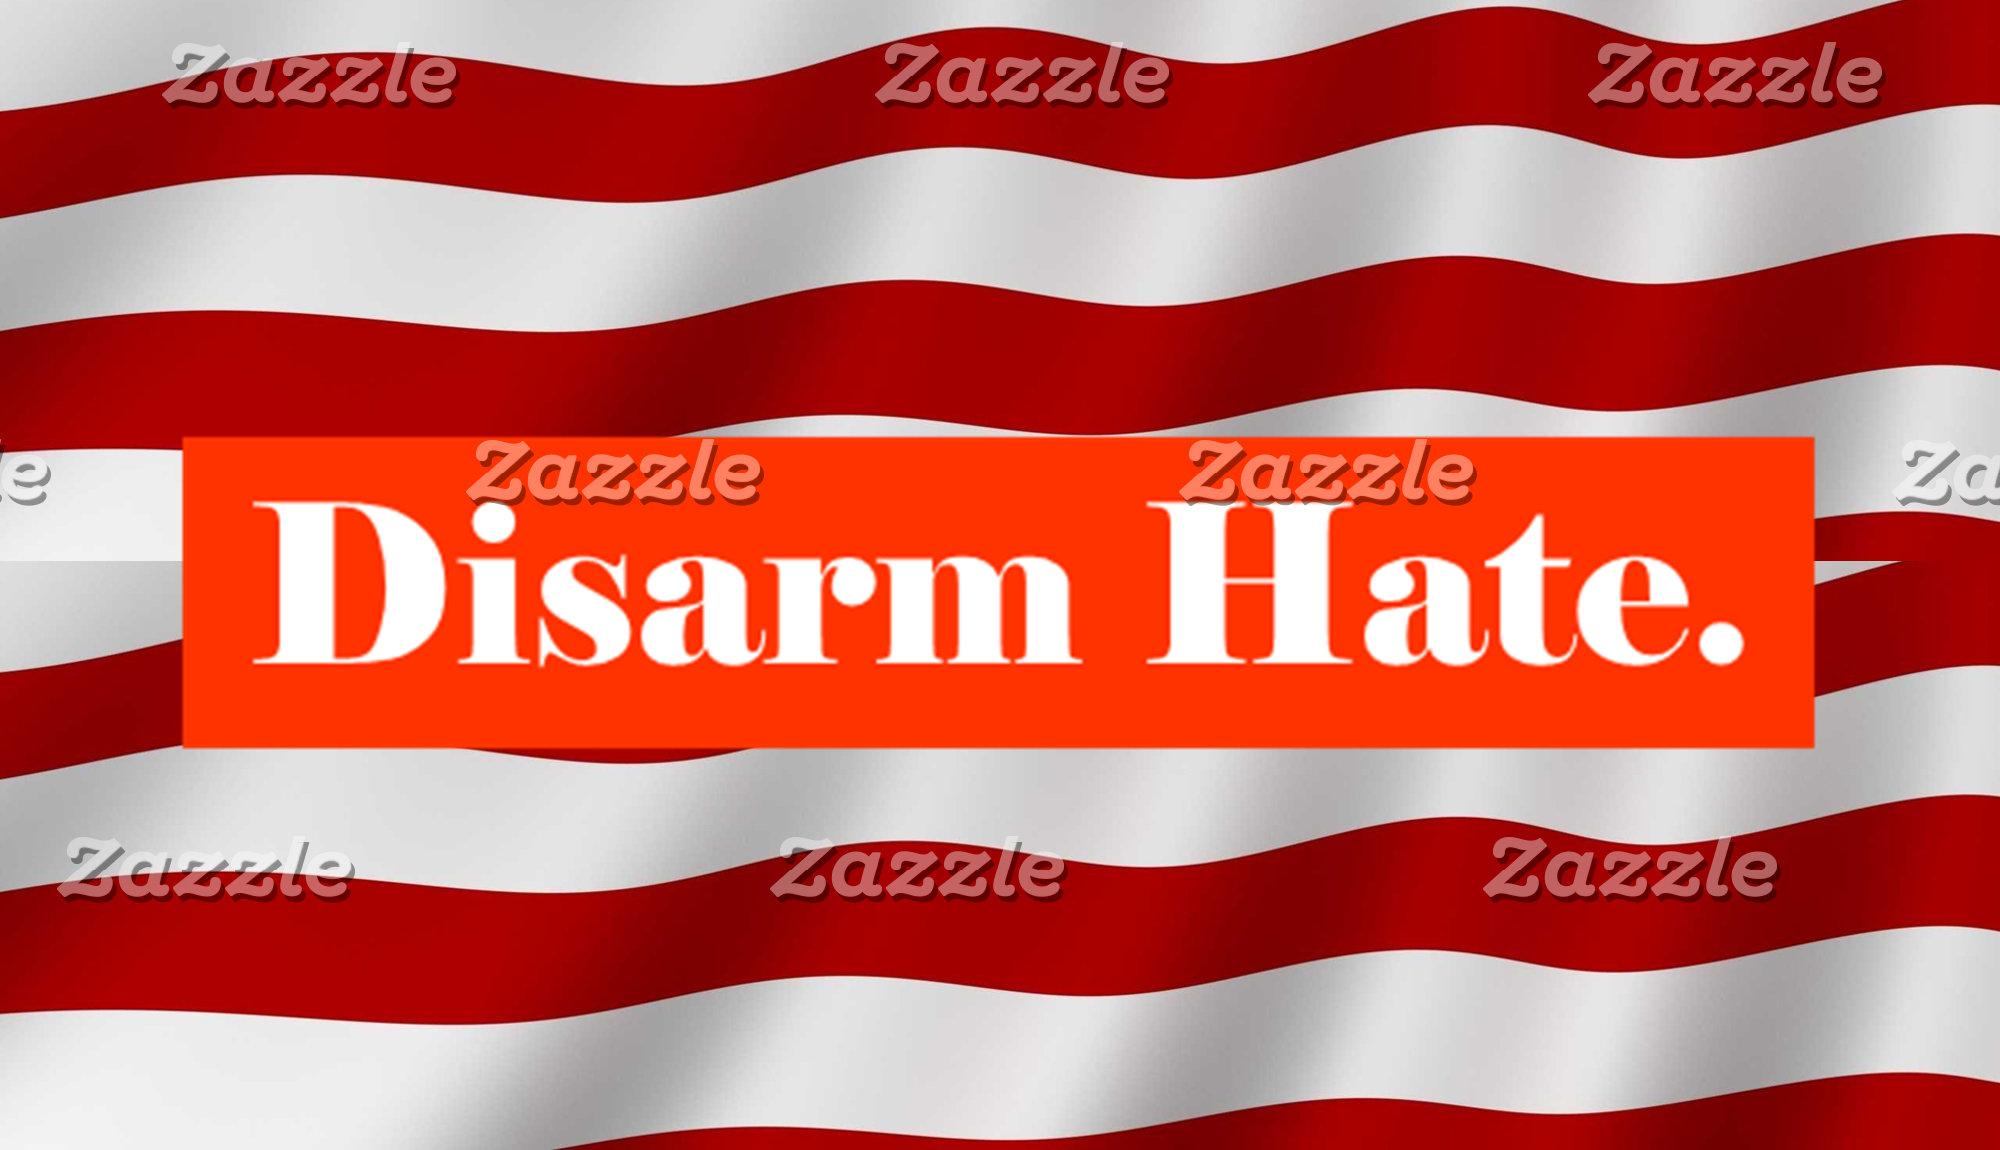 Disarm Hate.